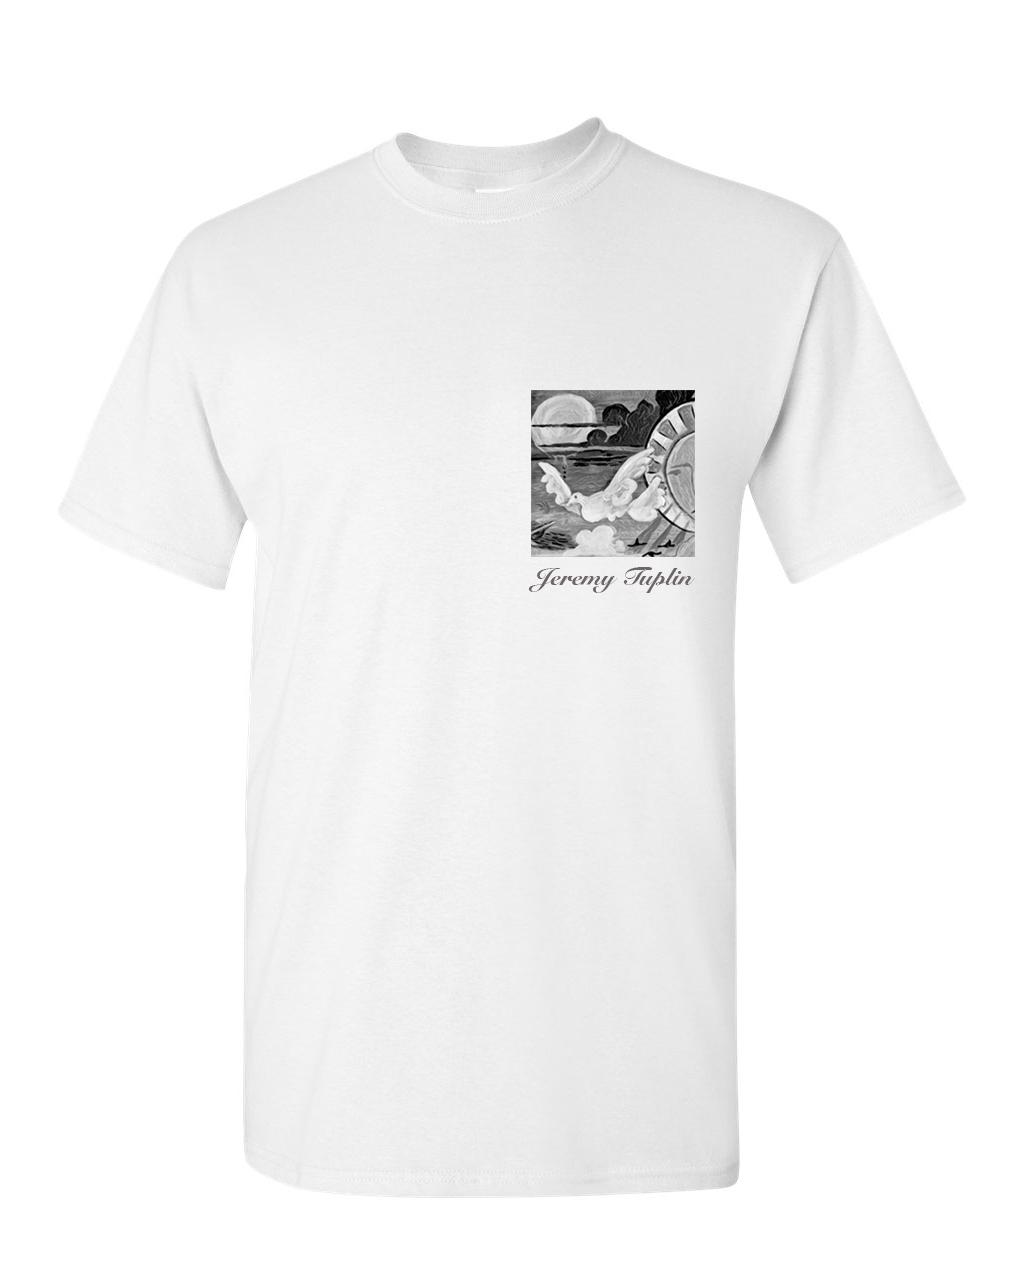 Jeremy Tuplin Pink Mirror T-Shirt